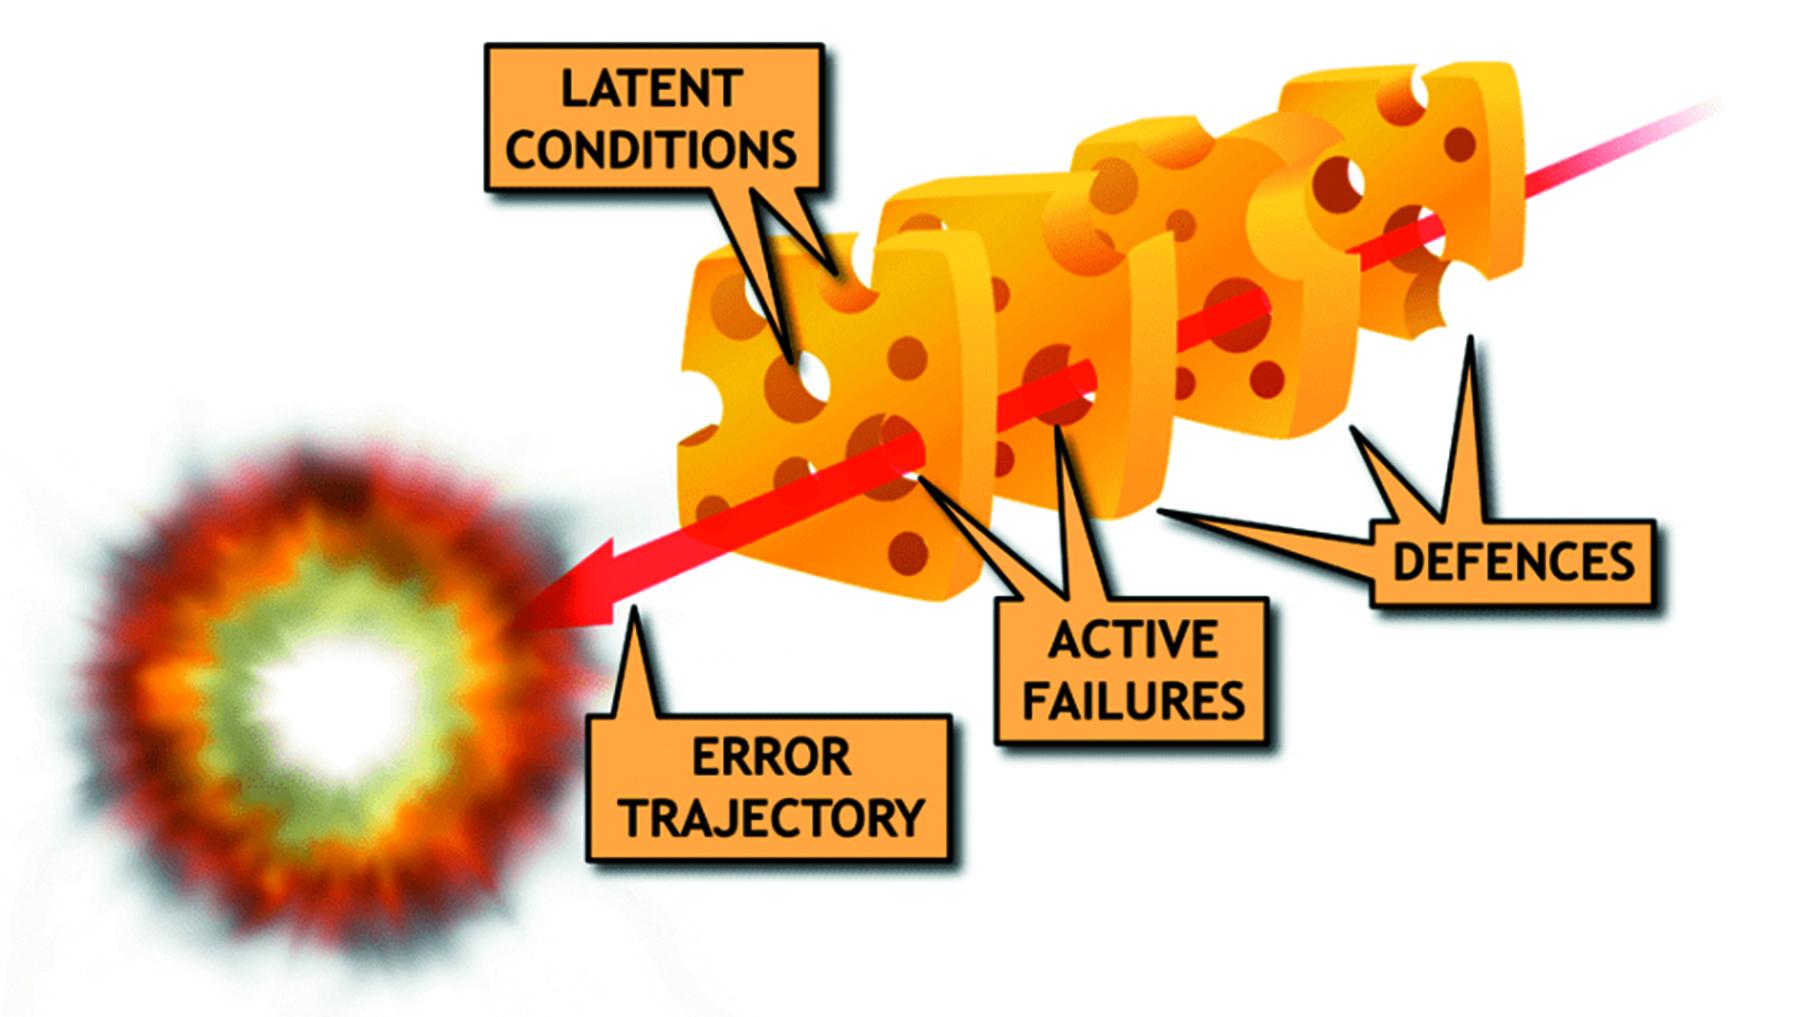 Statistical Risk Factors